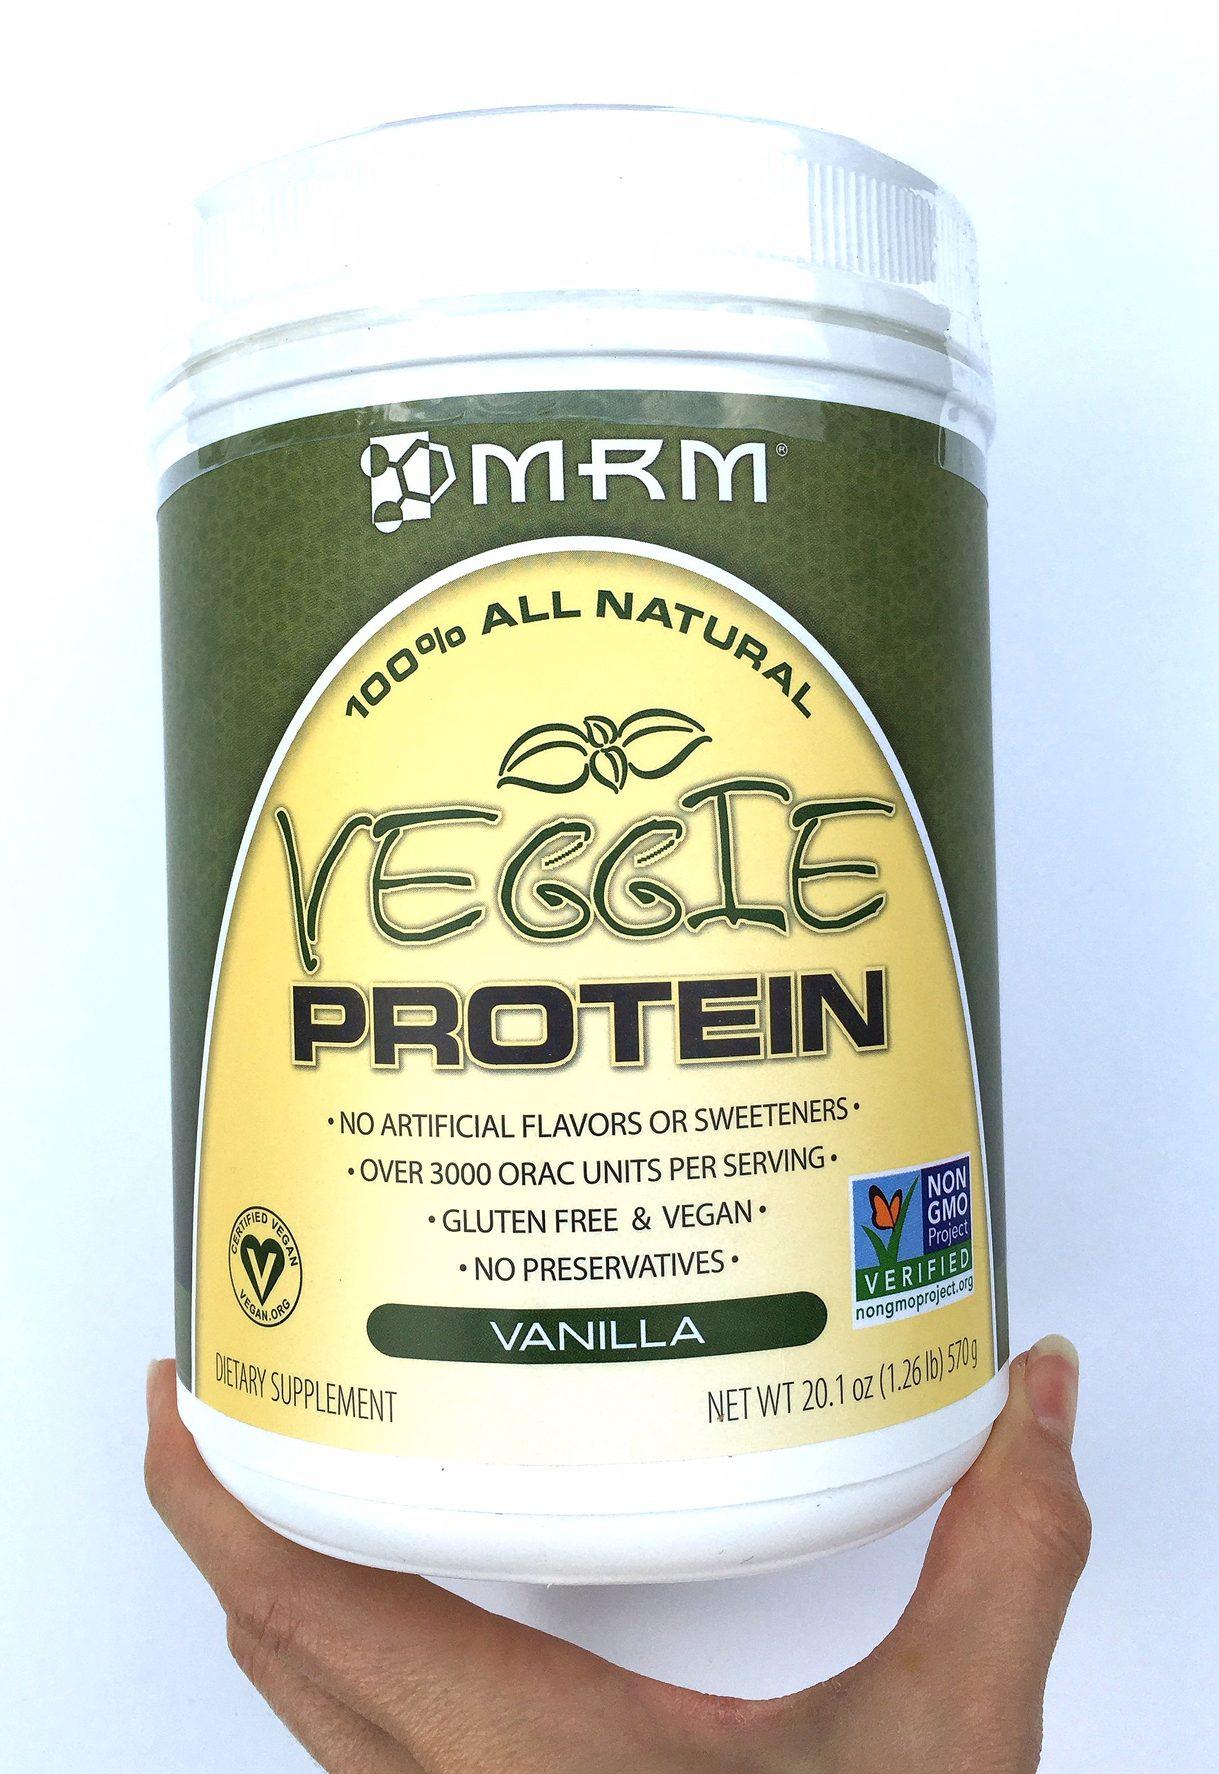 vegan protein, smoothie, protein shake, vegan